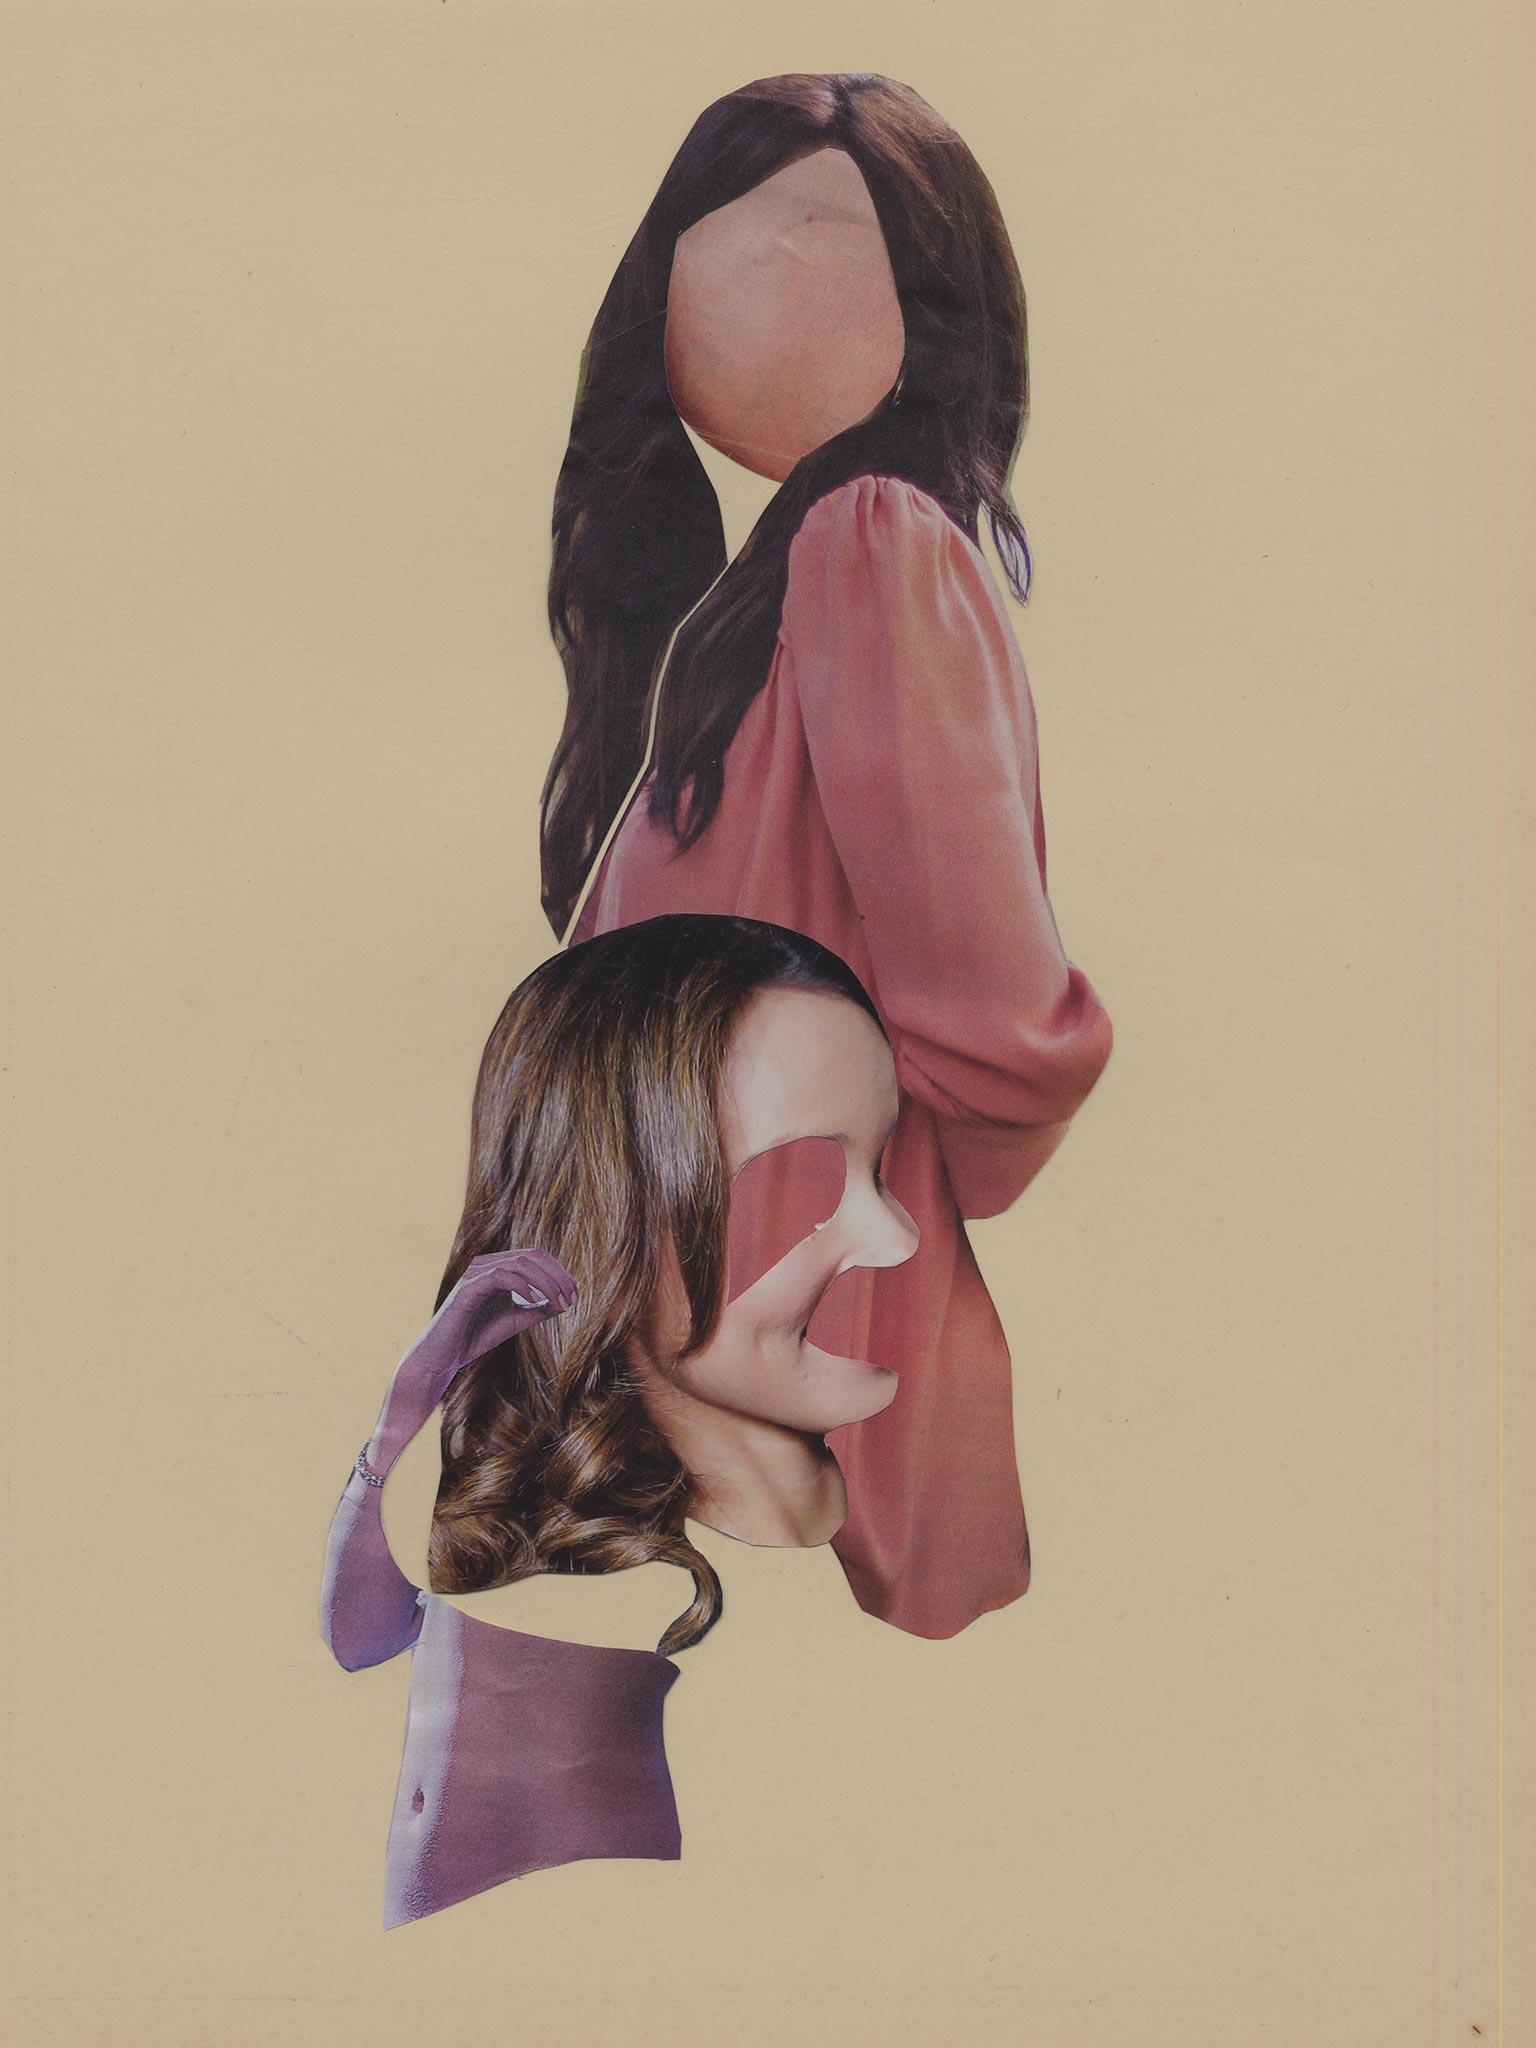 paula-roush-pinkpress-004